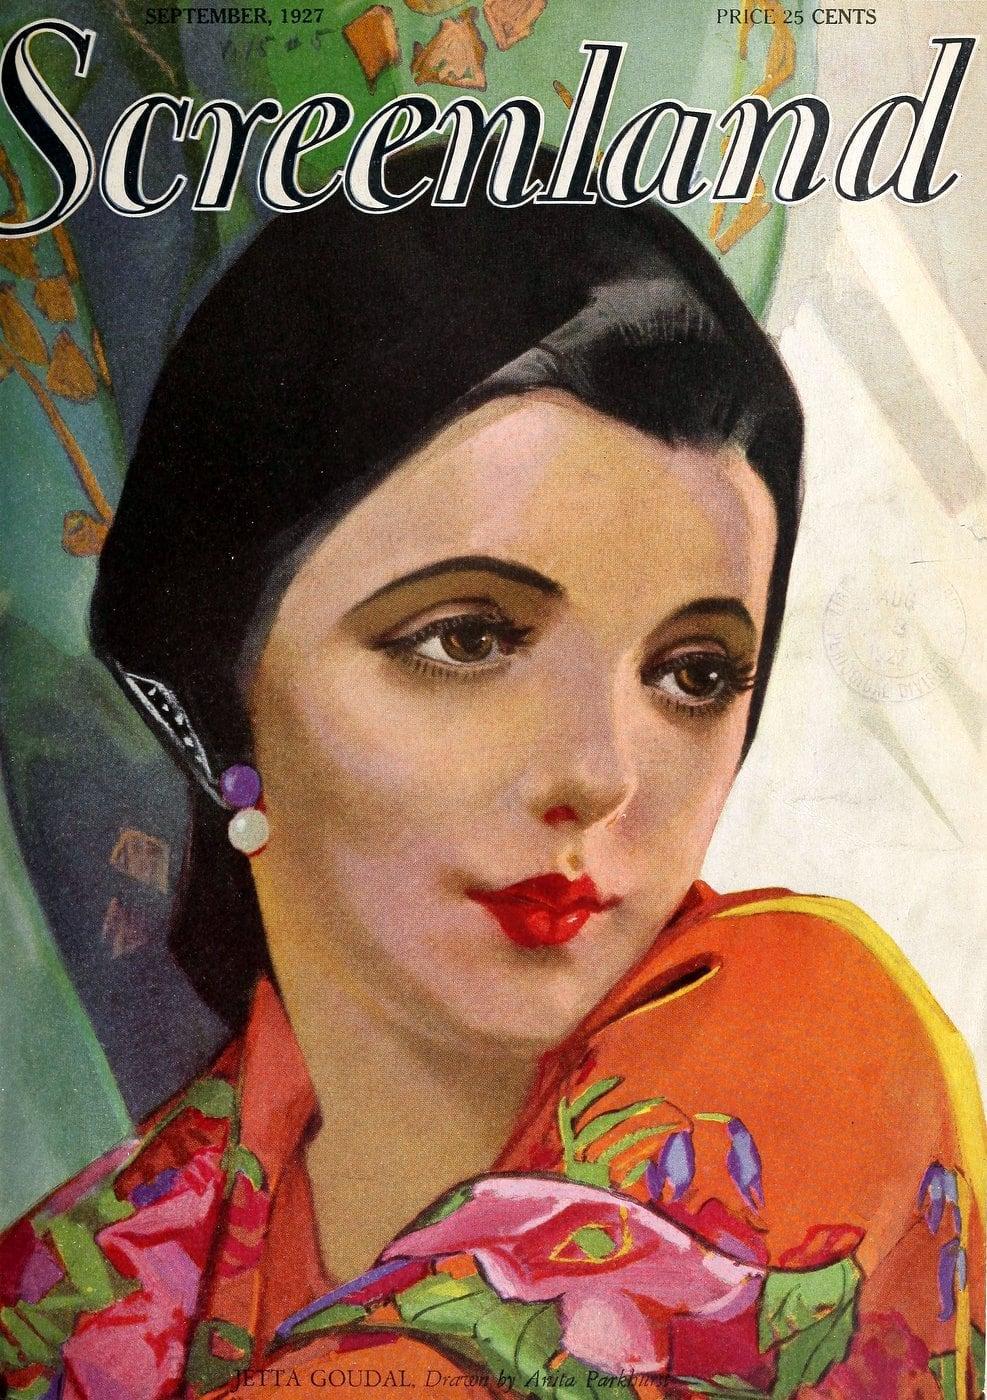 Screenland magazine actress Jetta Goudal 1927